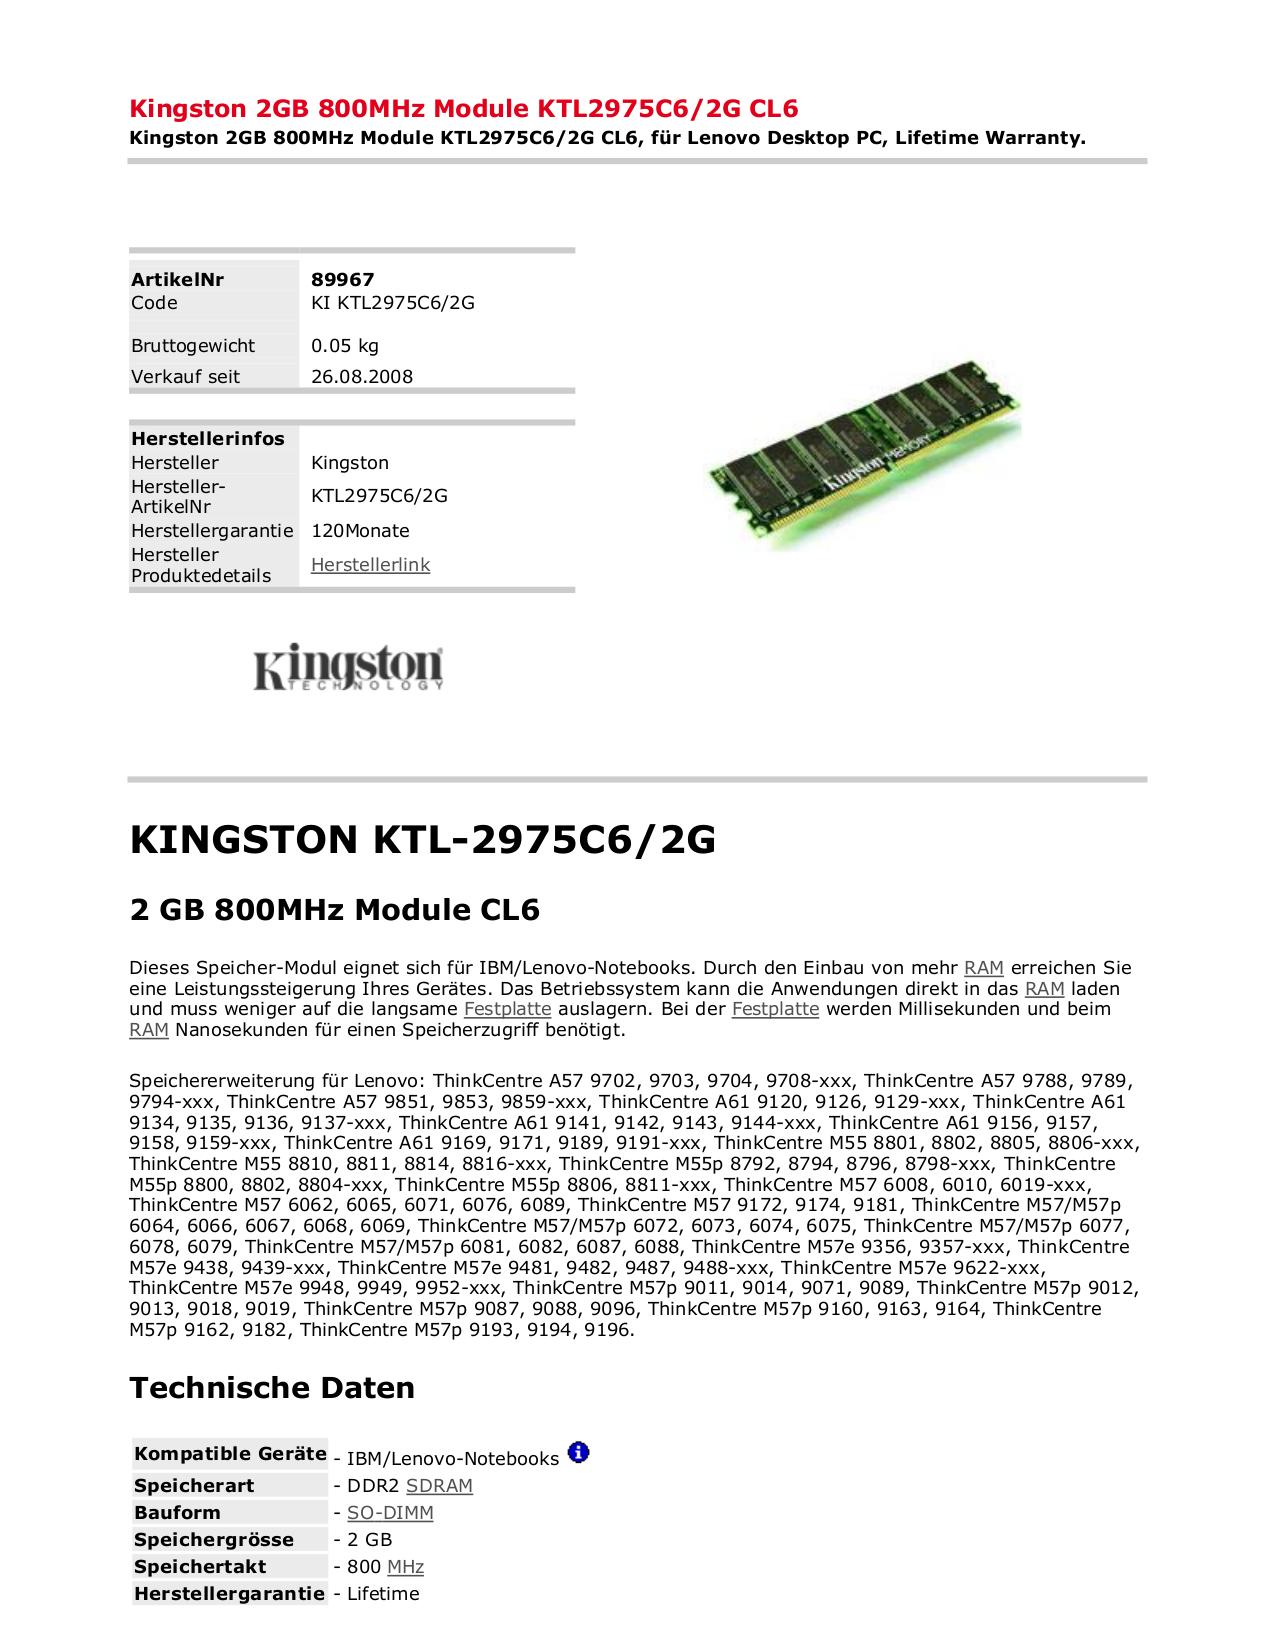 pdf for Lenovo Desktop ThinkCentre M57e 9481 manual